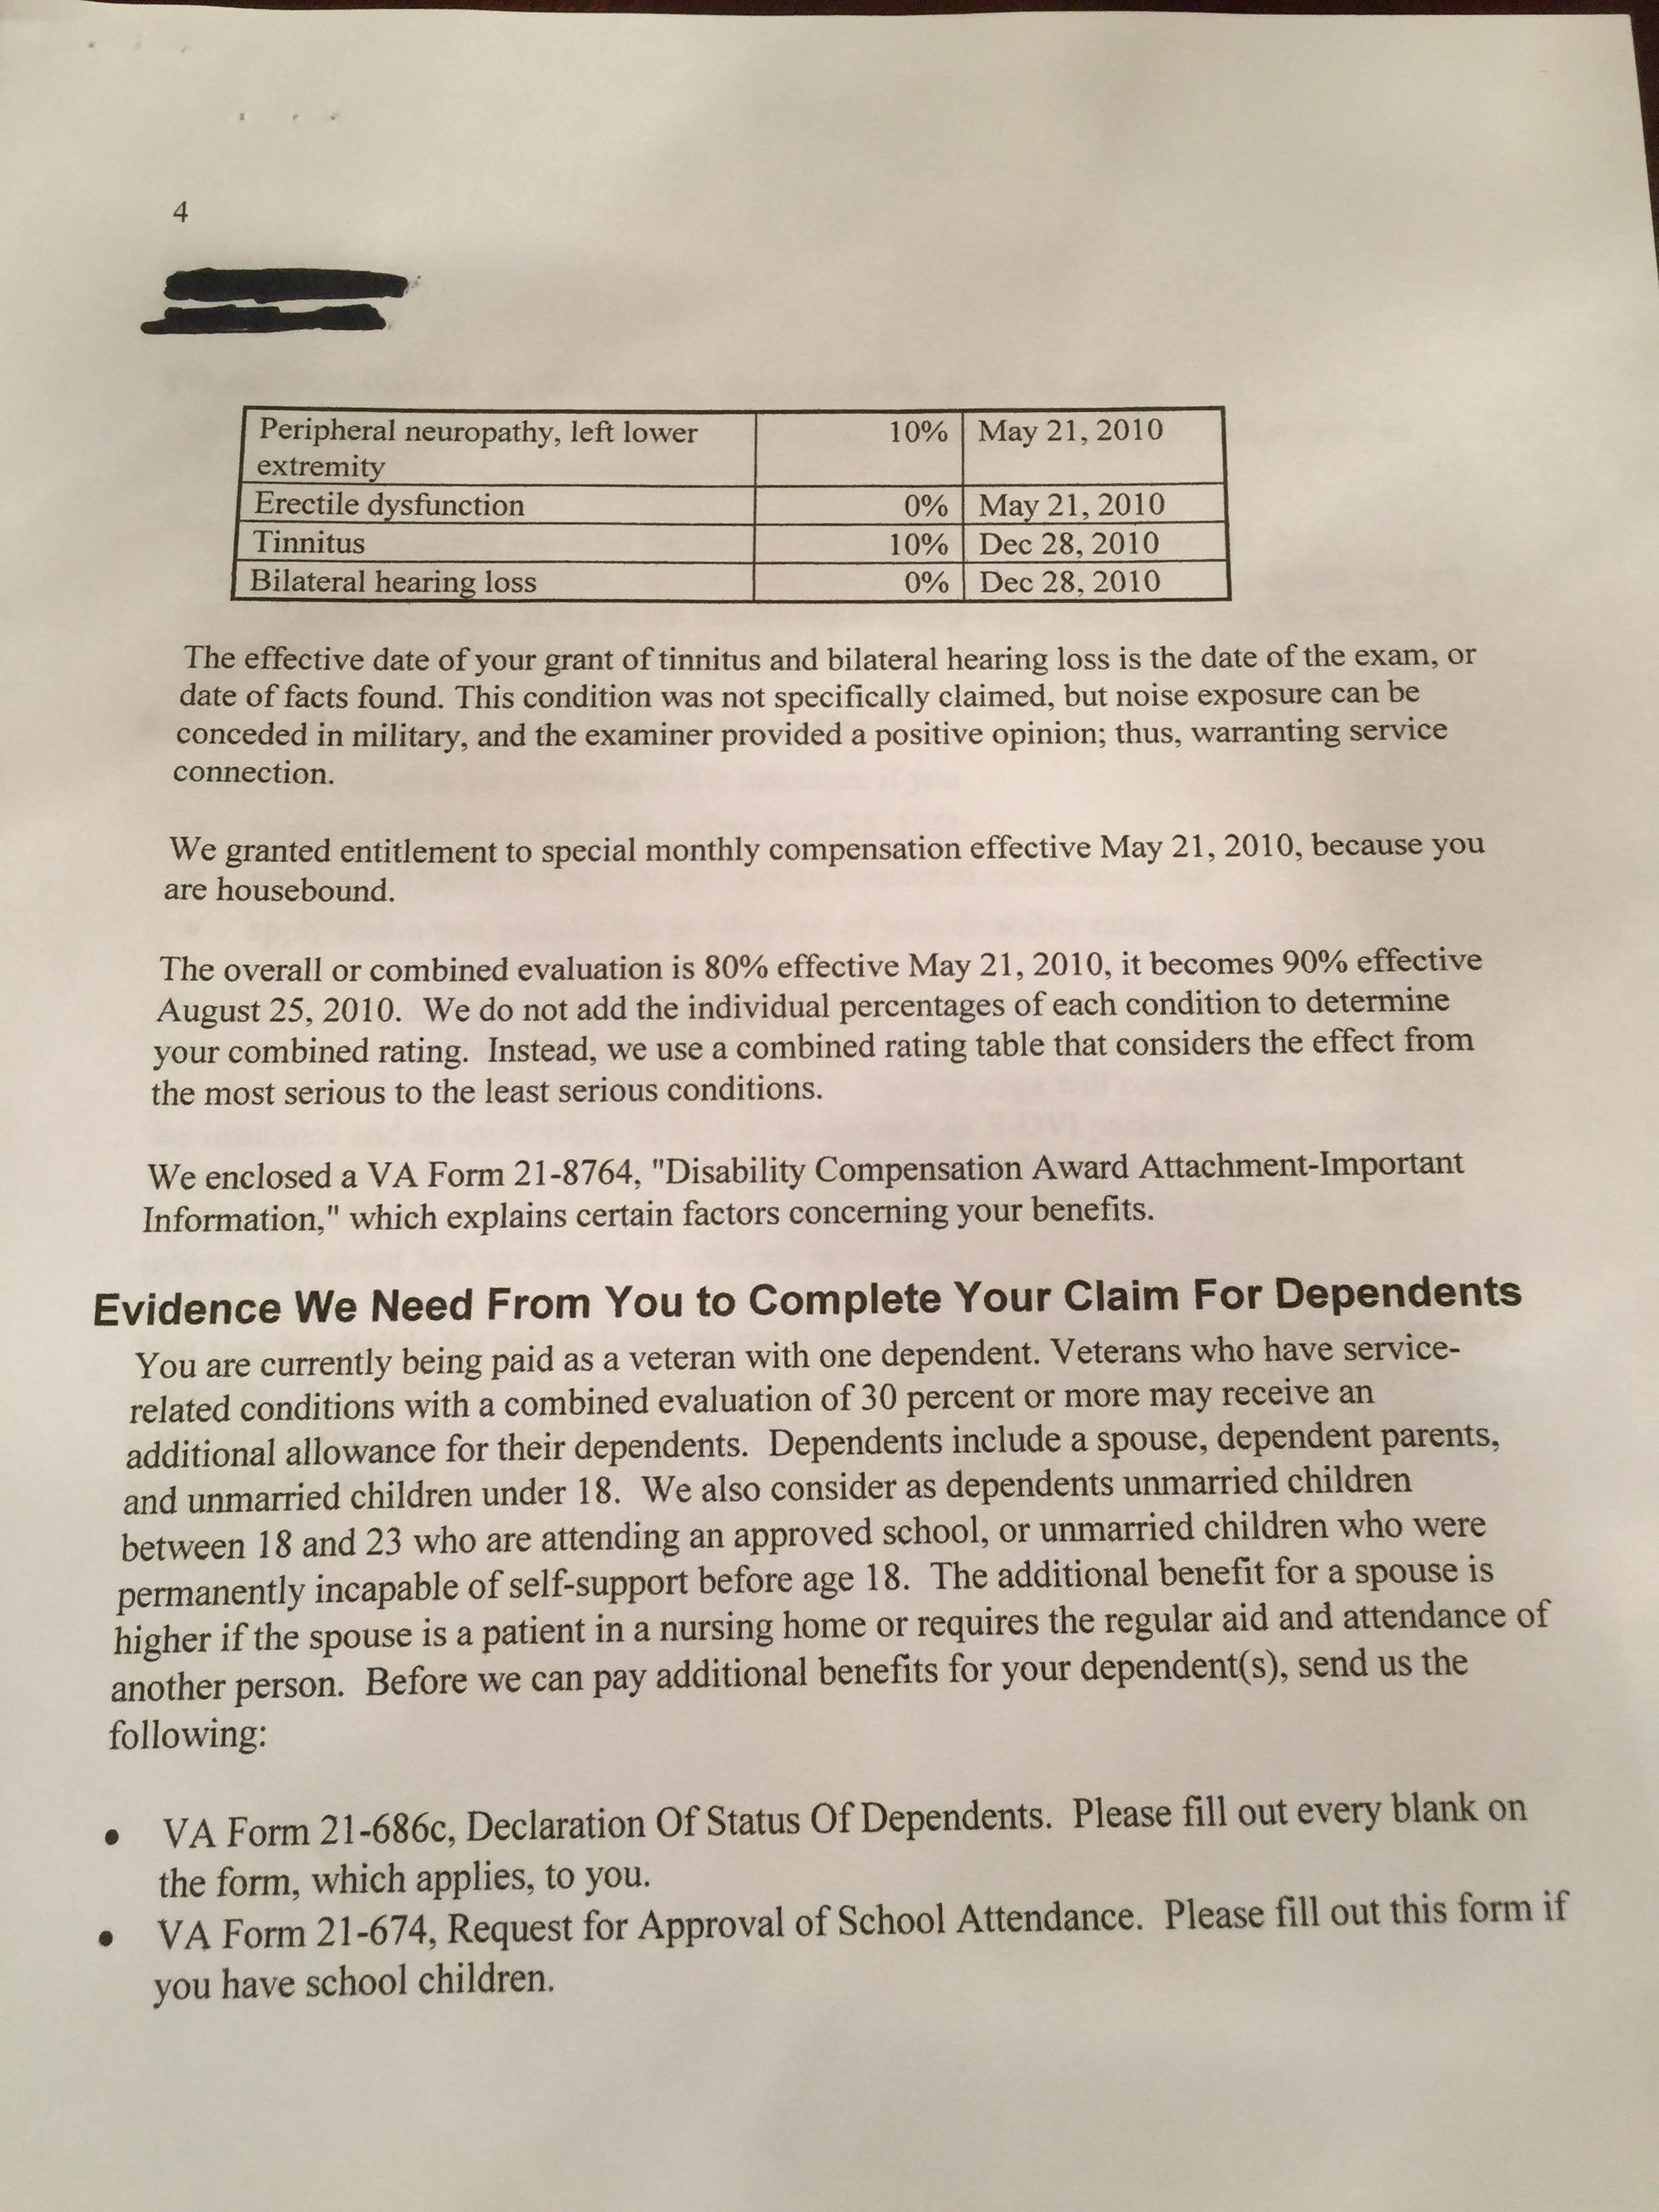 SMC S awarded never paid - VA Disability Compensation